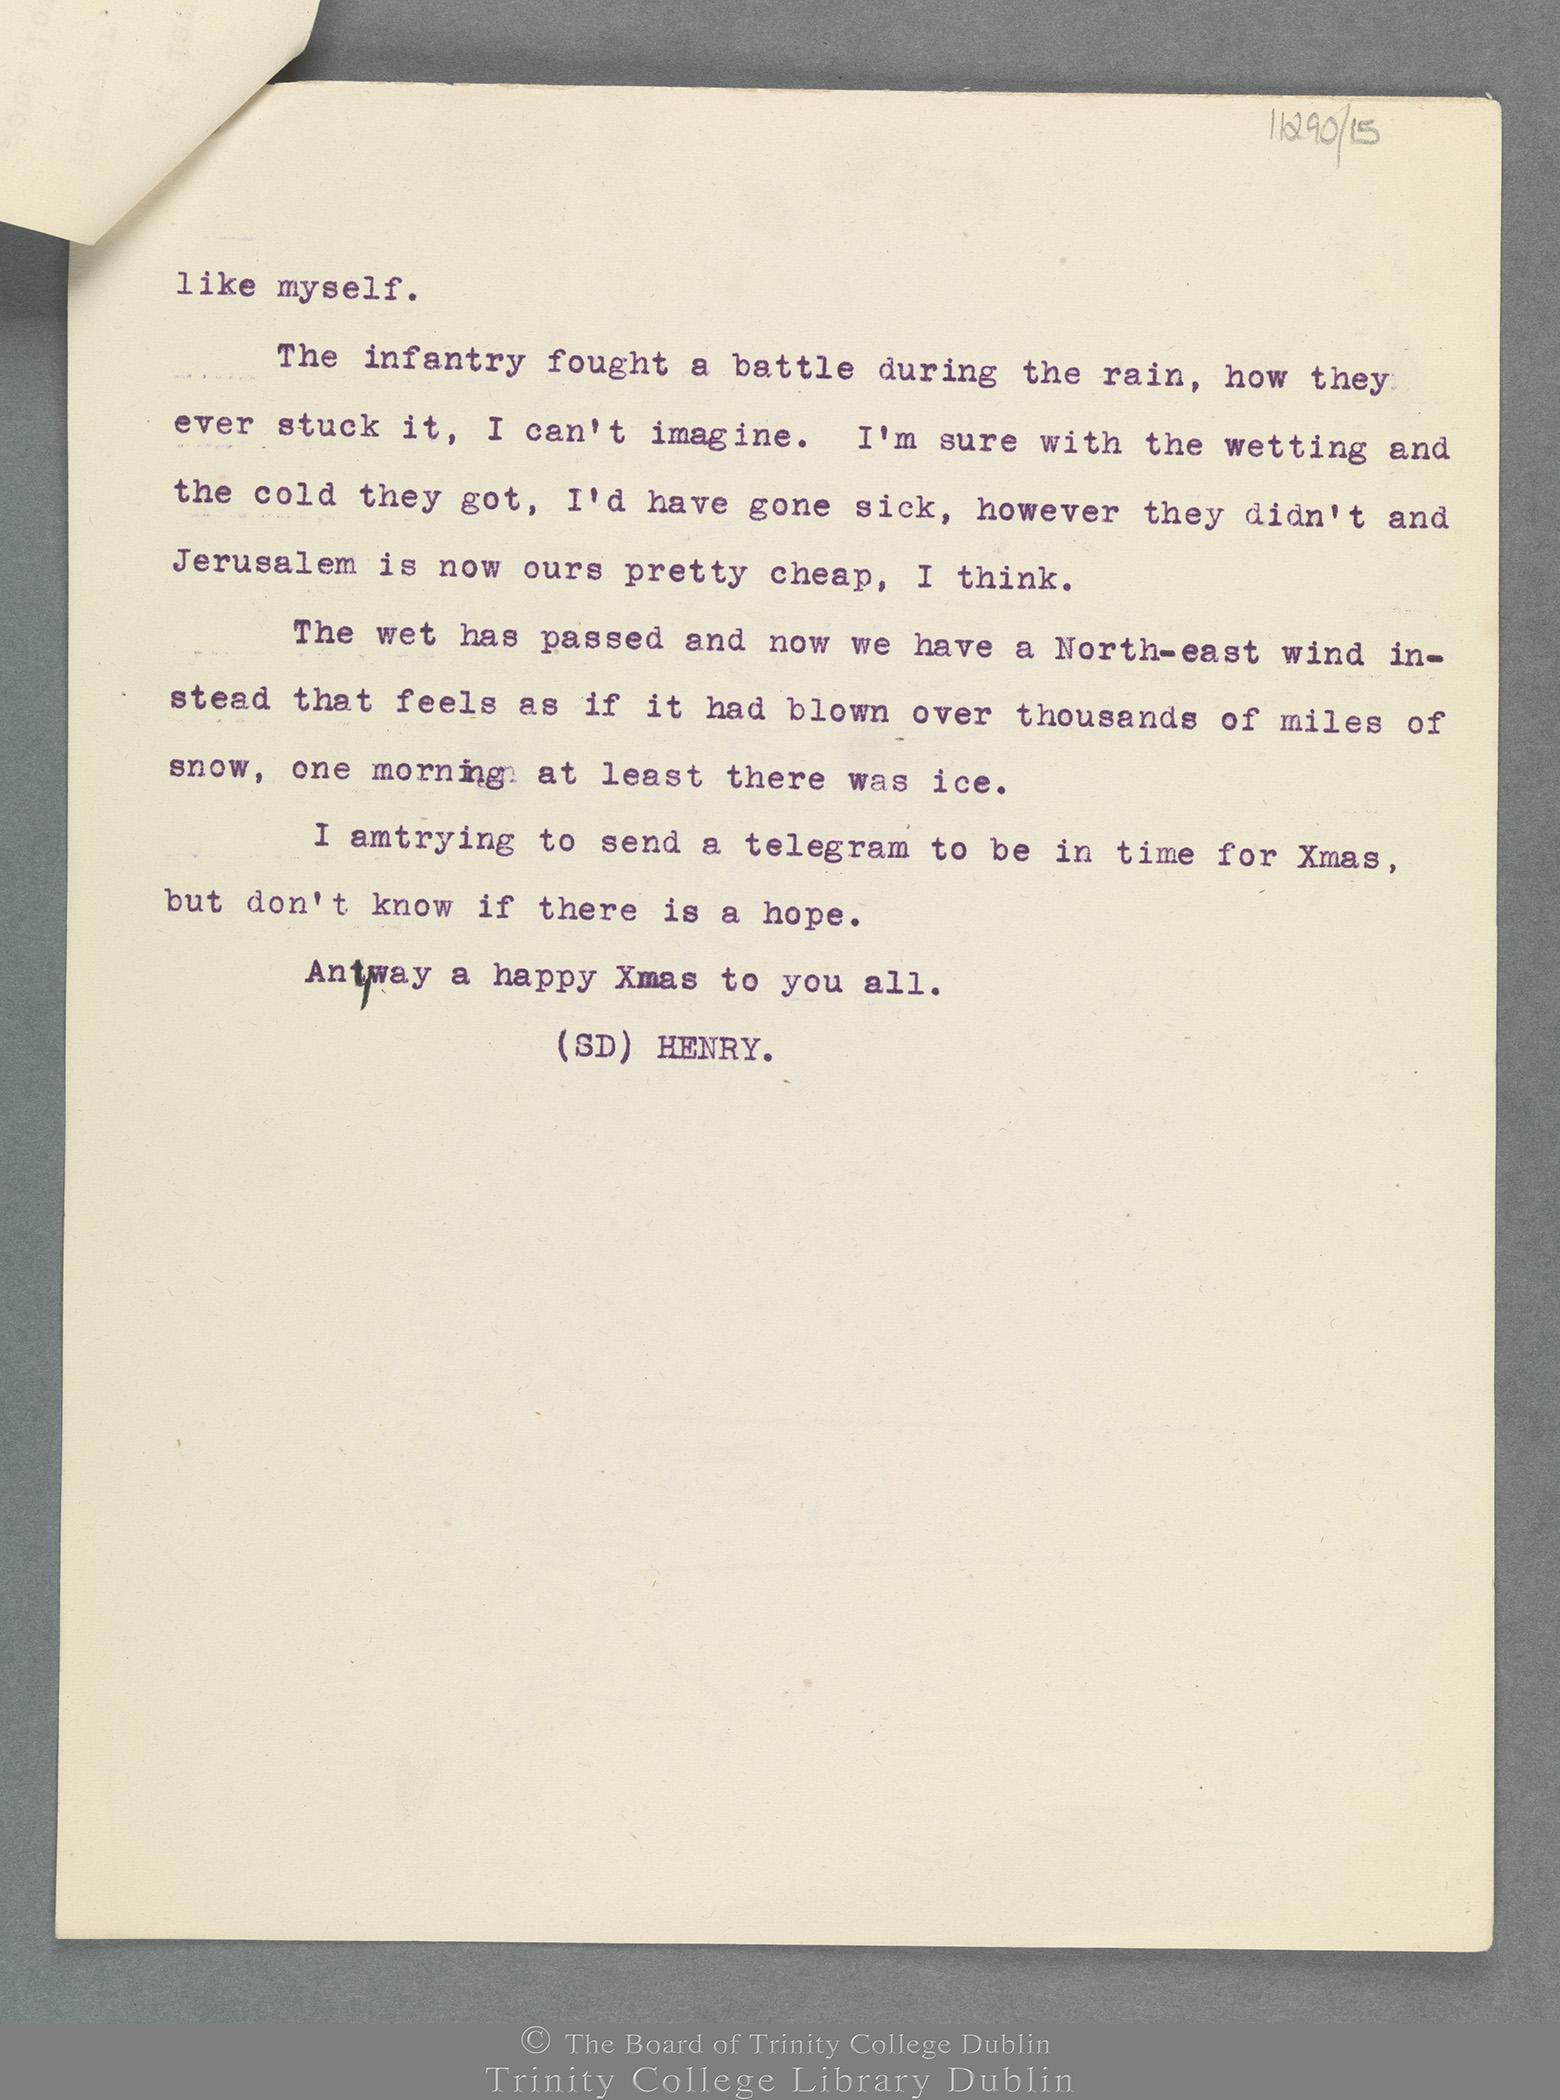 TCD MS 11290/15 folio 3 recto